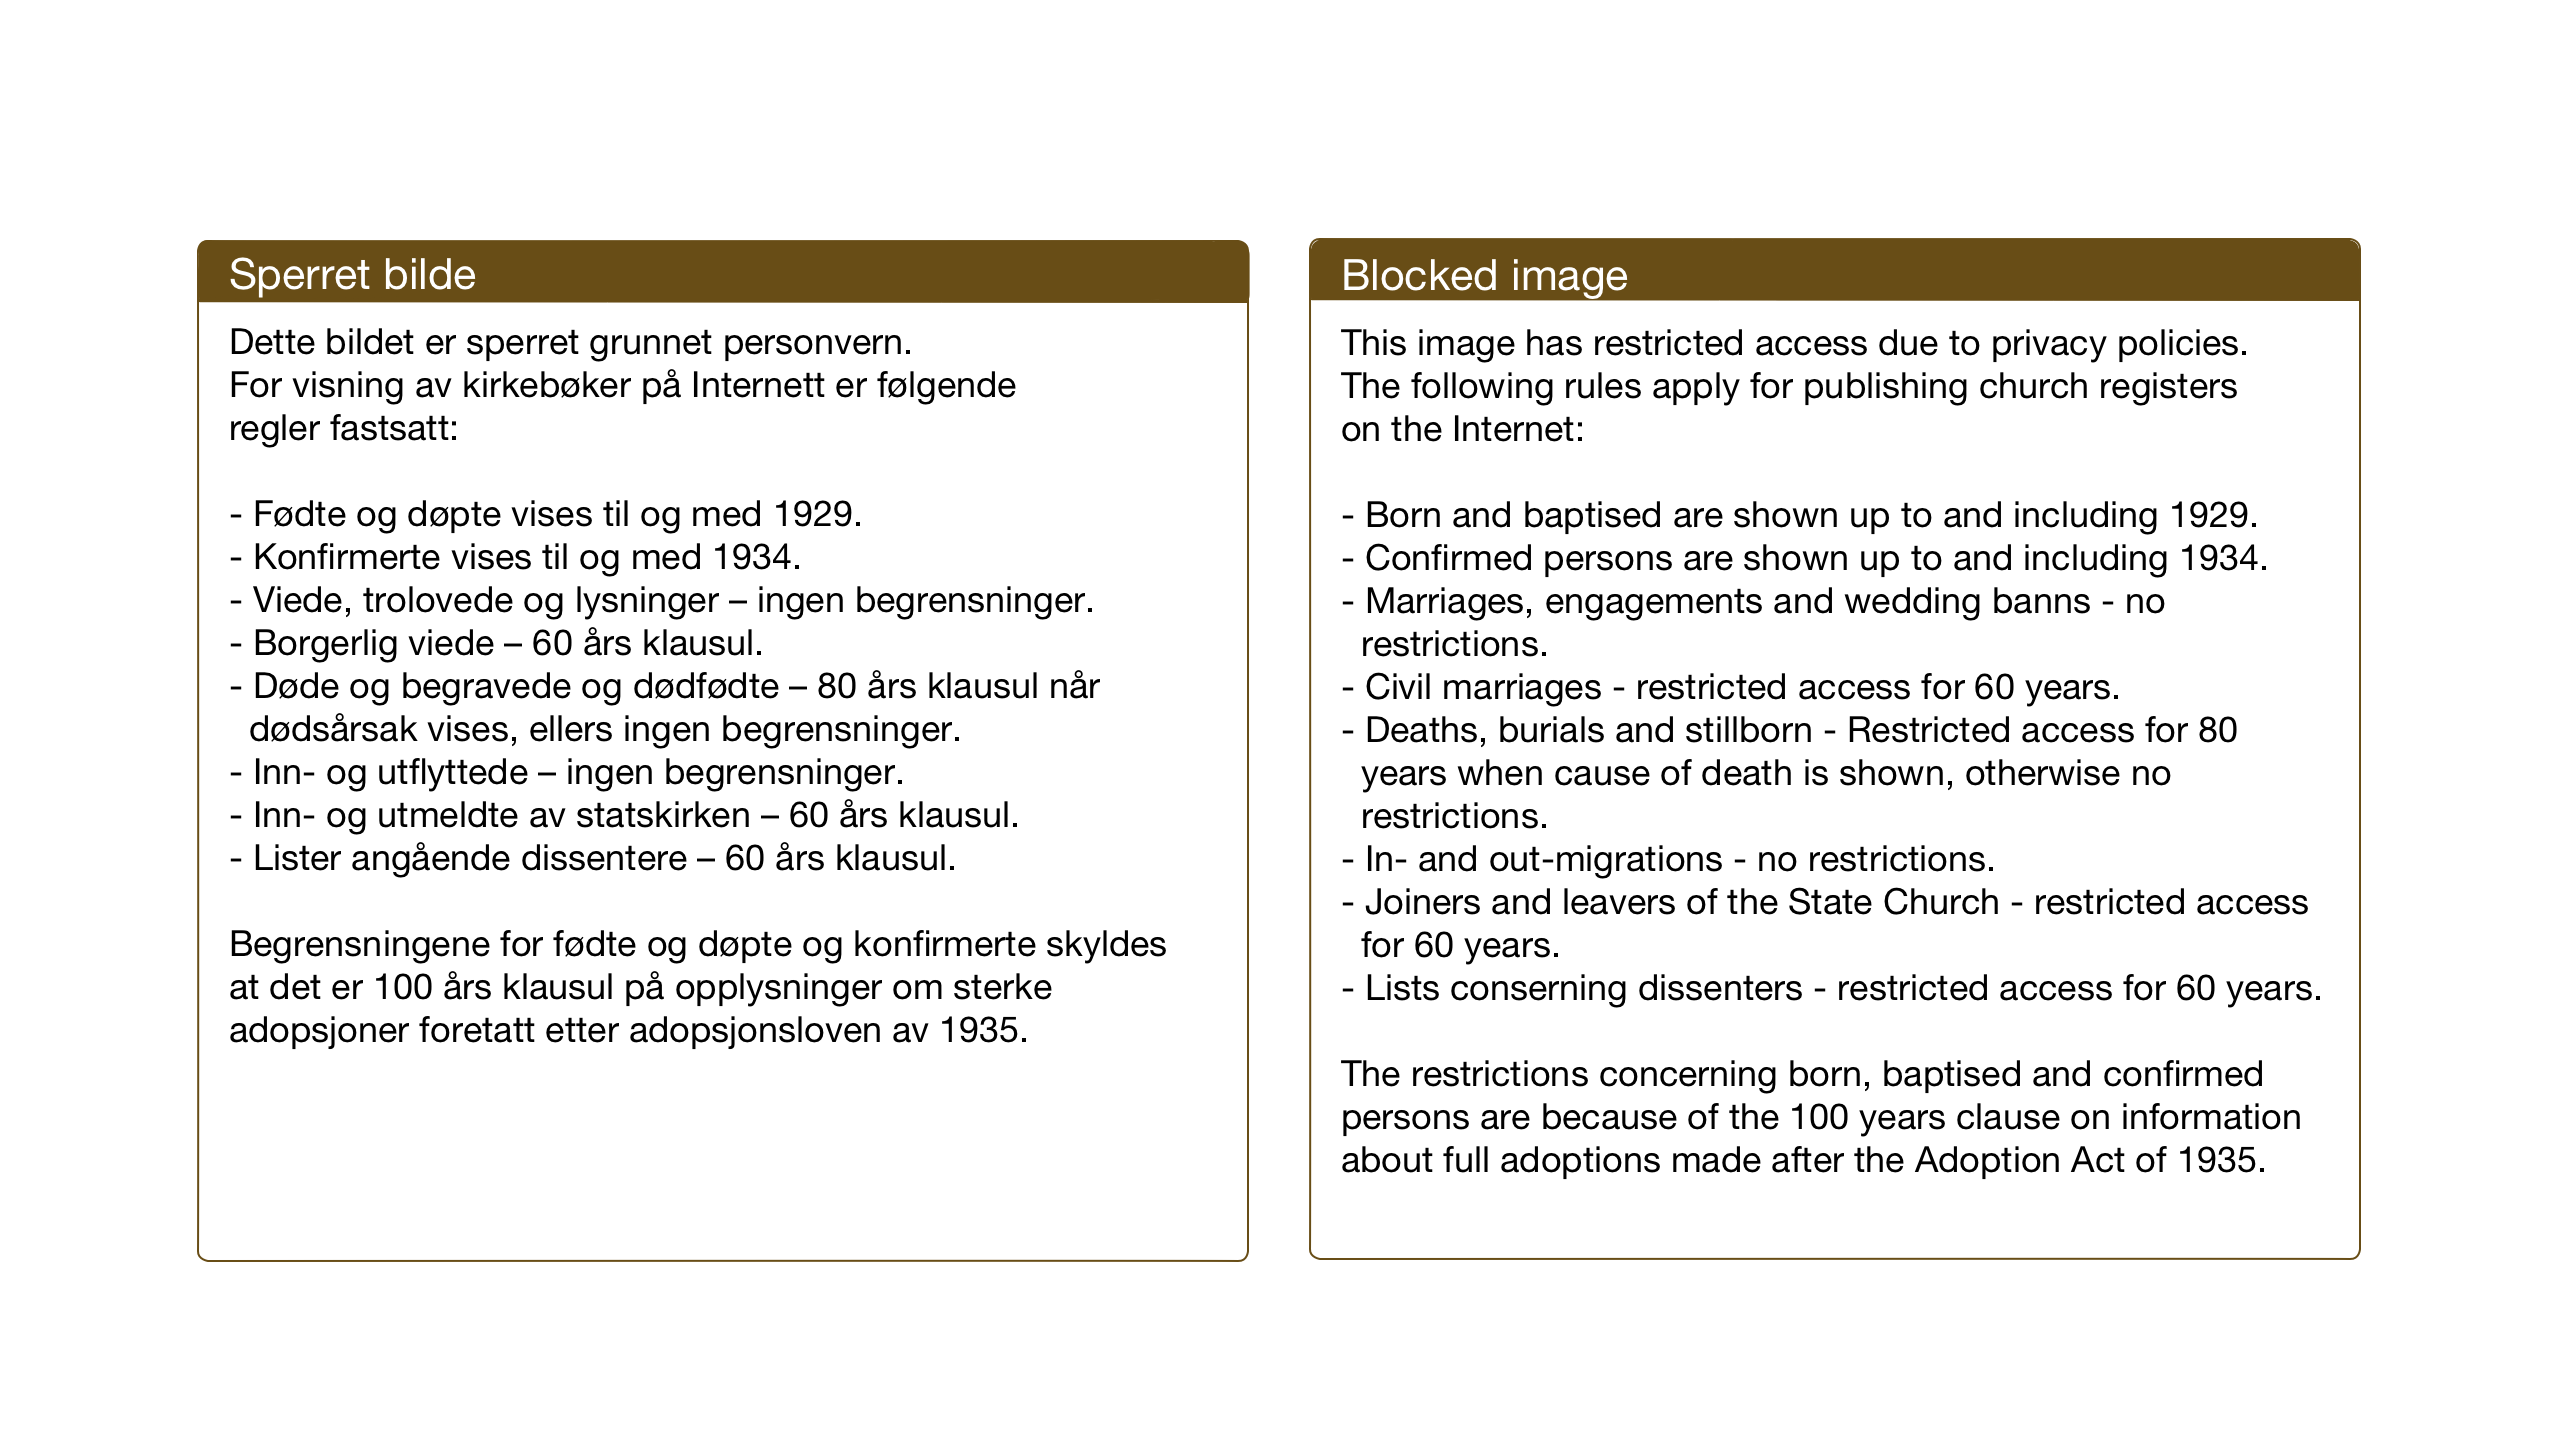 SAT, Ministerialprotokoller, klokkerbøker og fødselsregistre - Nordland, 847/L0680: Klokkerbok nr. 847C08, 1930-1947, s. 303